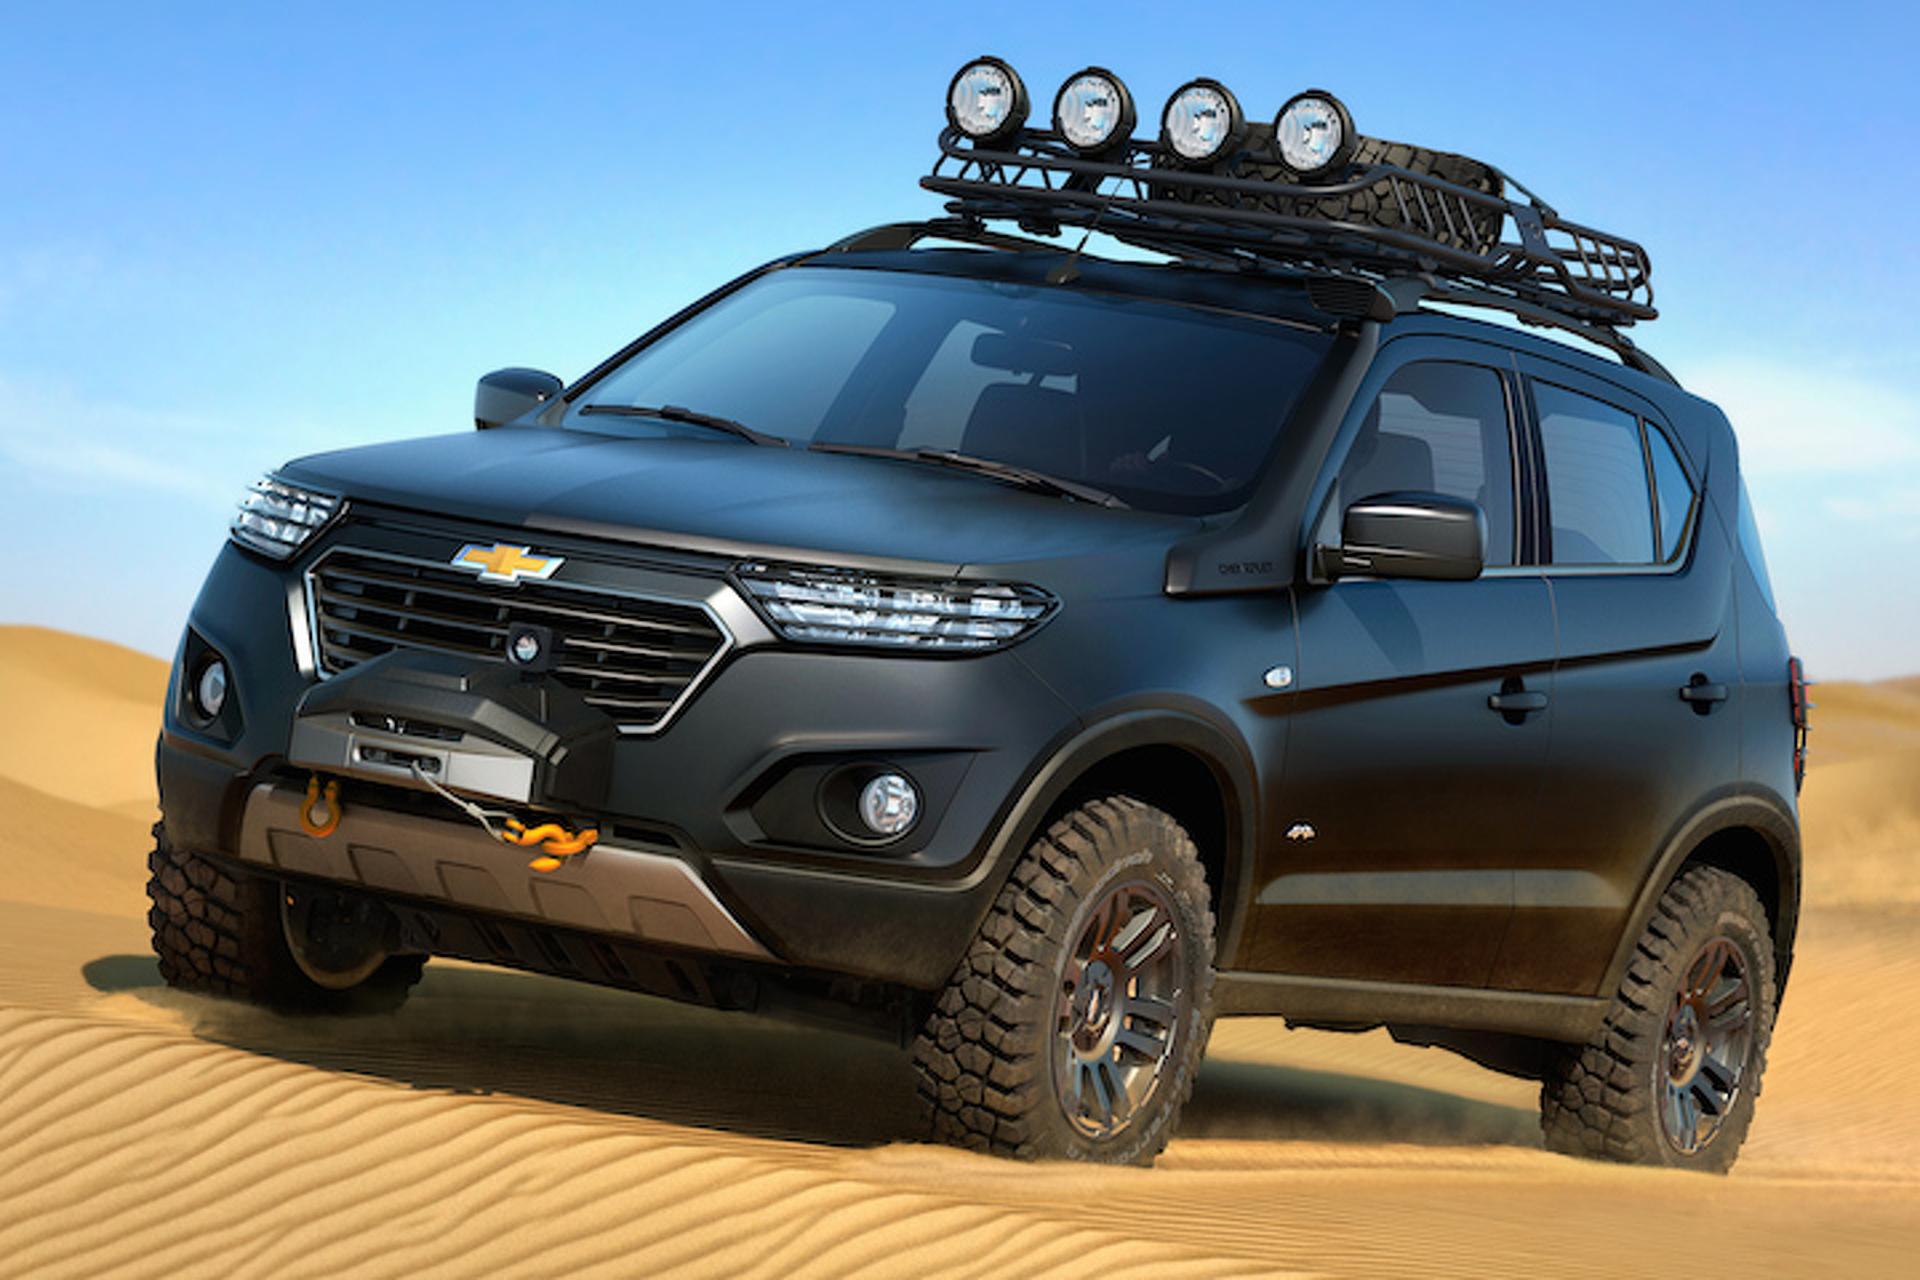 Chevrolet Niva 4x4 Barrels into Moscow Auto Show